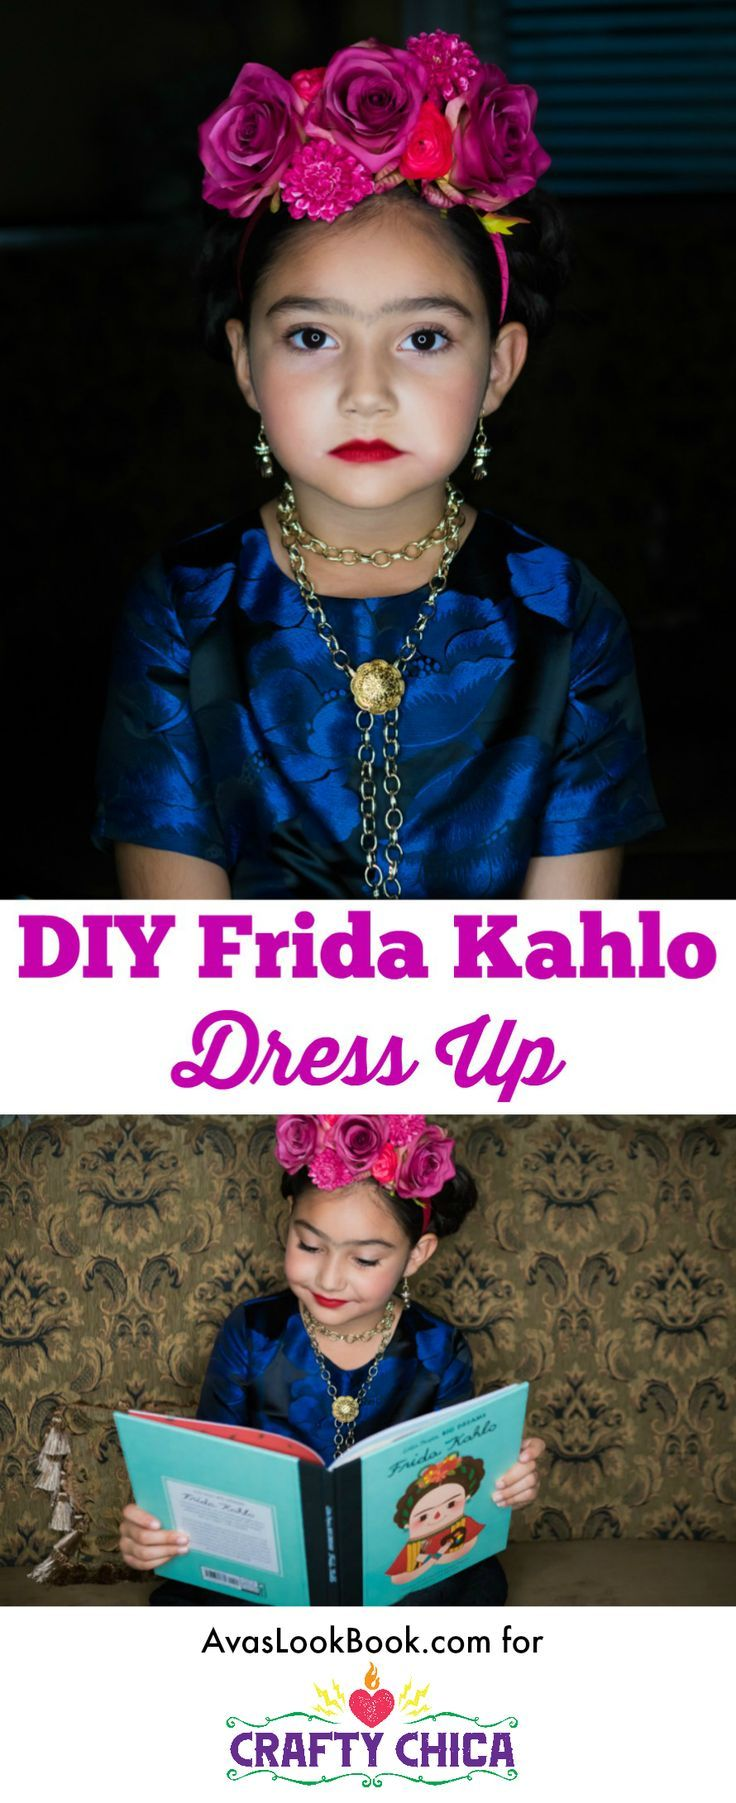 DIY Frida Kahlo Costume - Crafty Chica